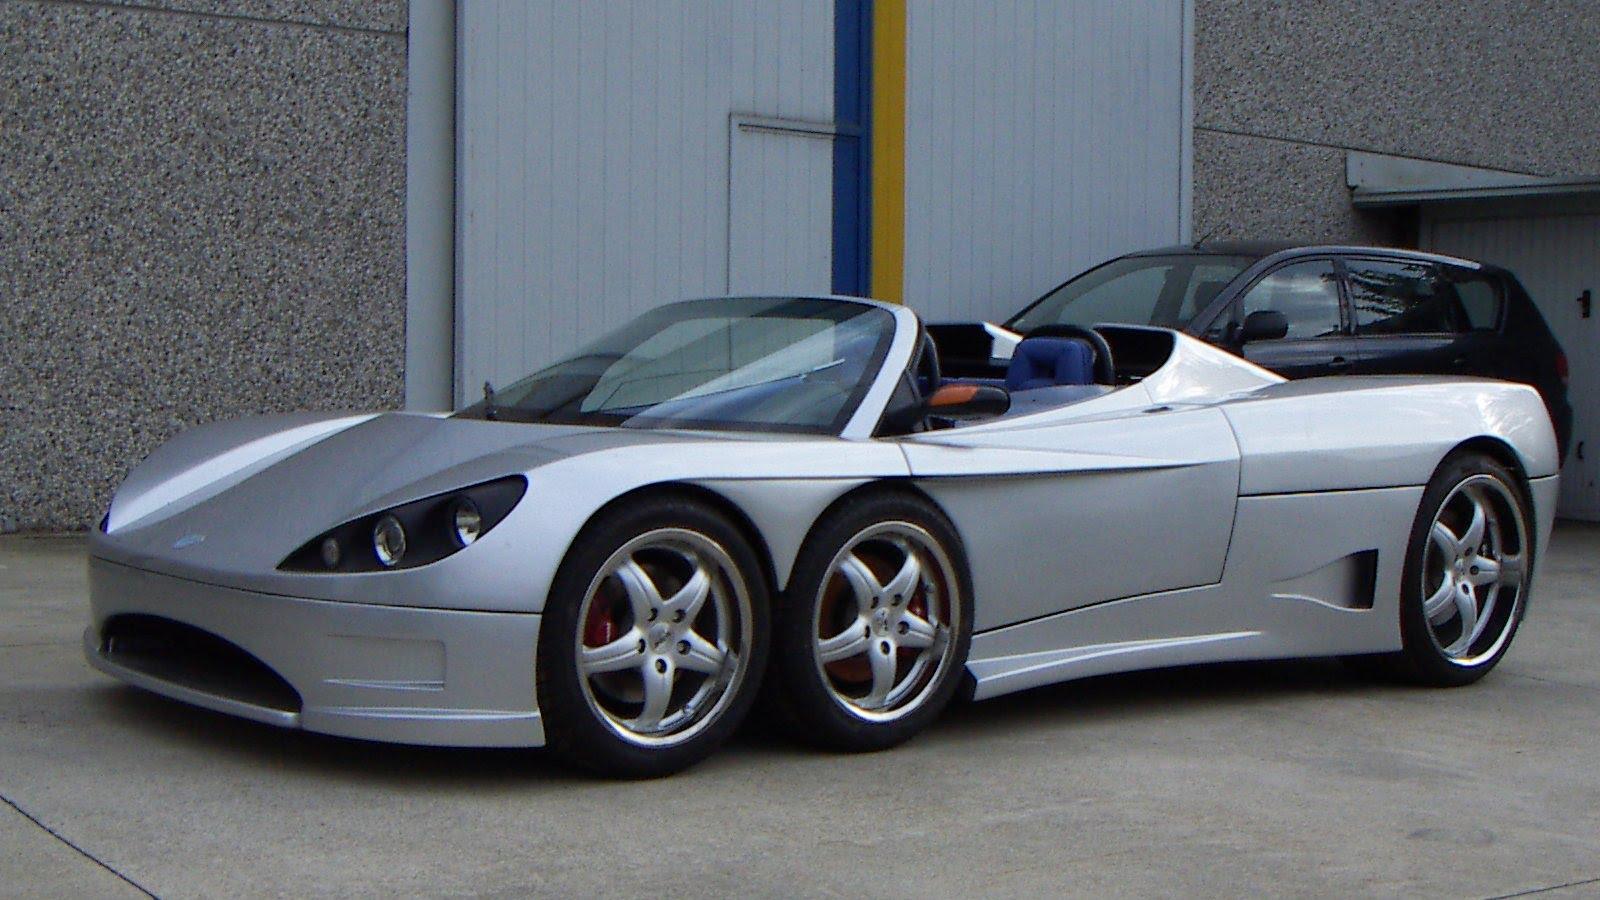 Rare Supercars - covini